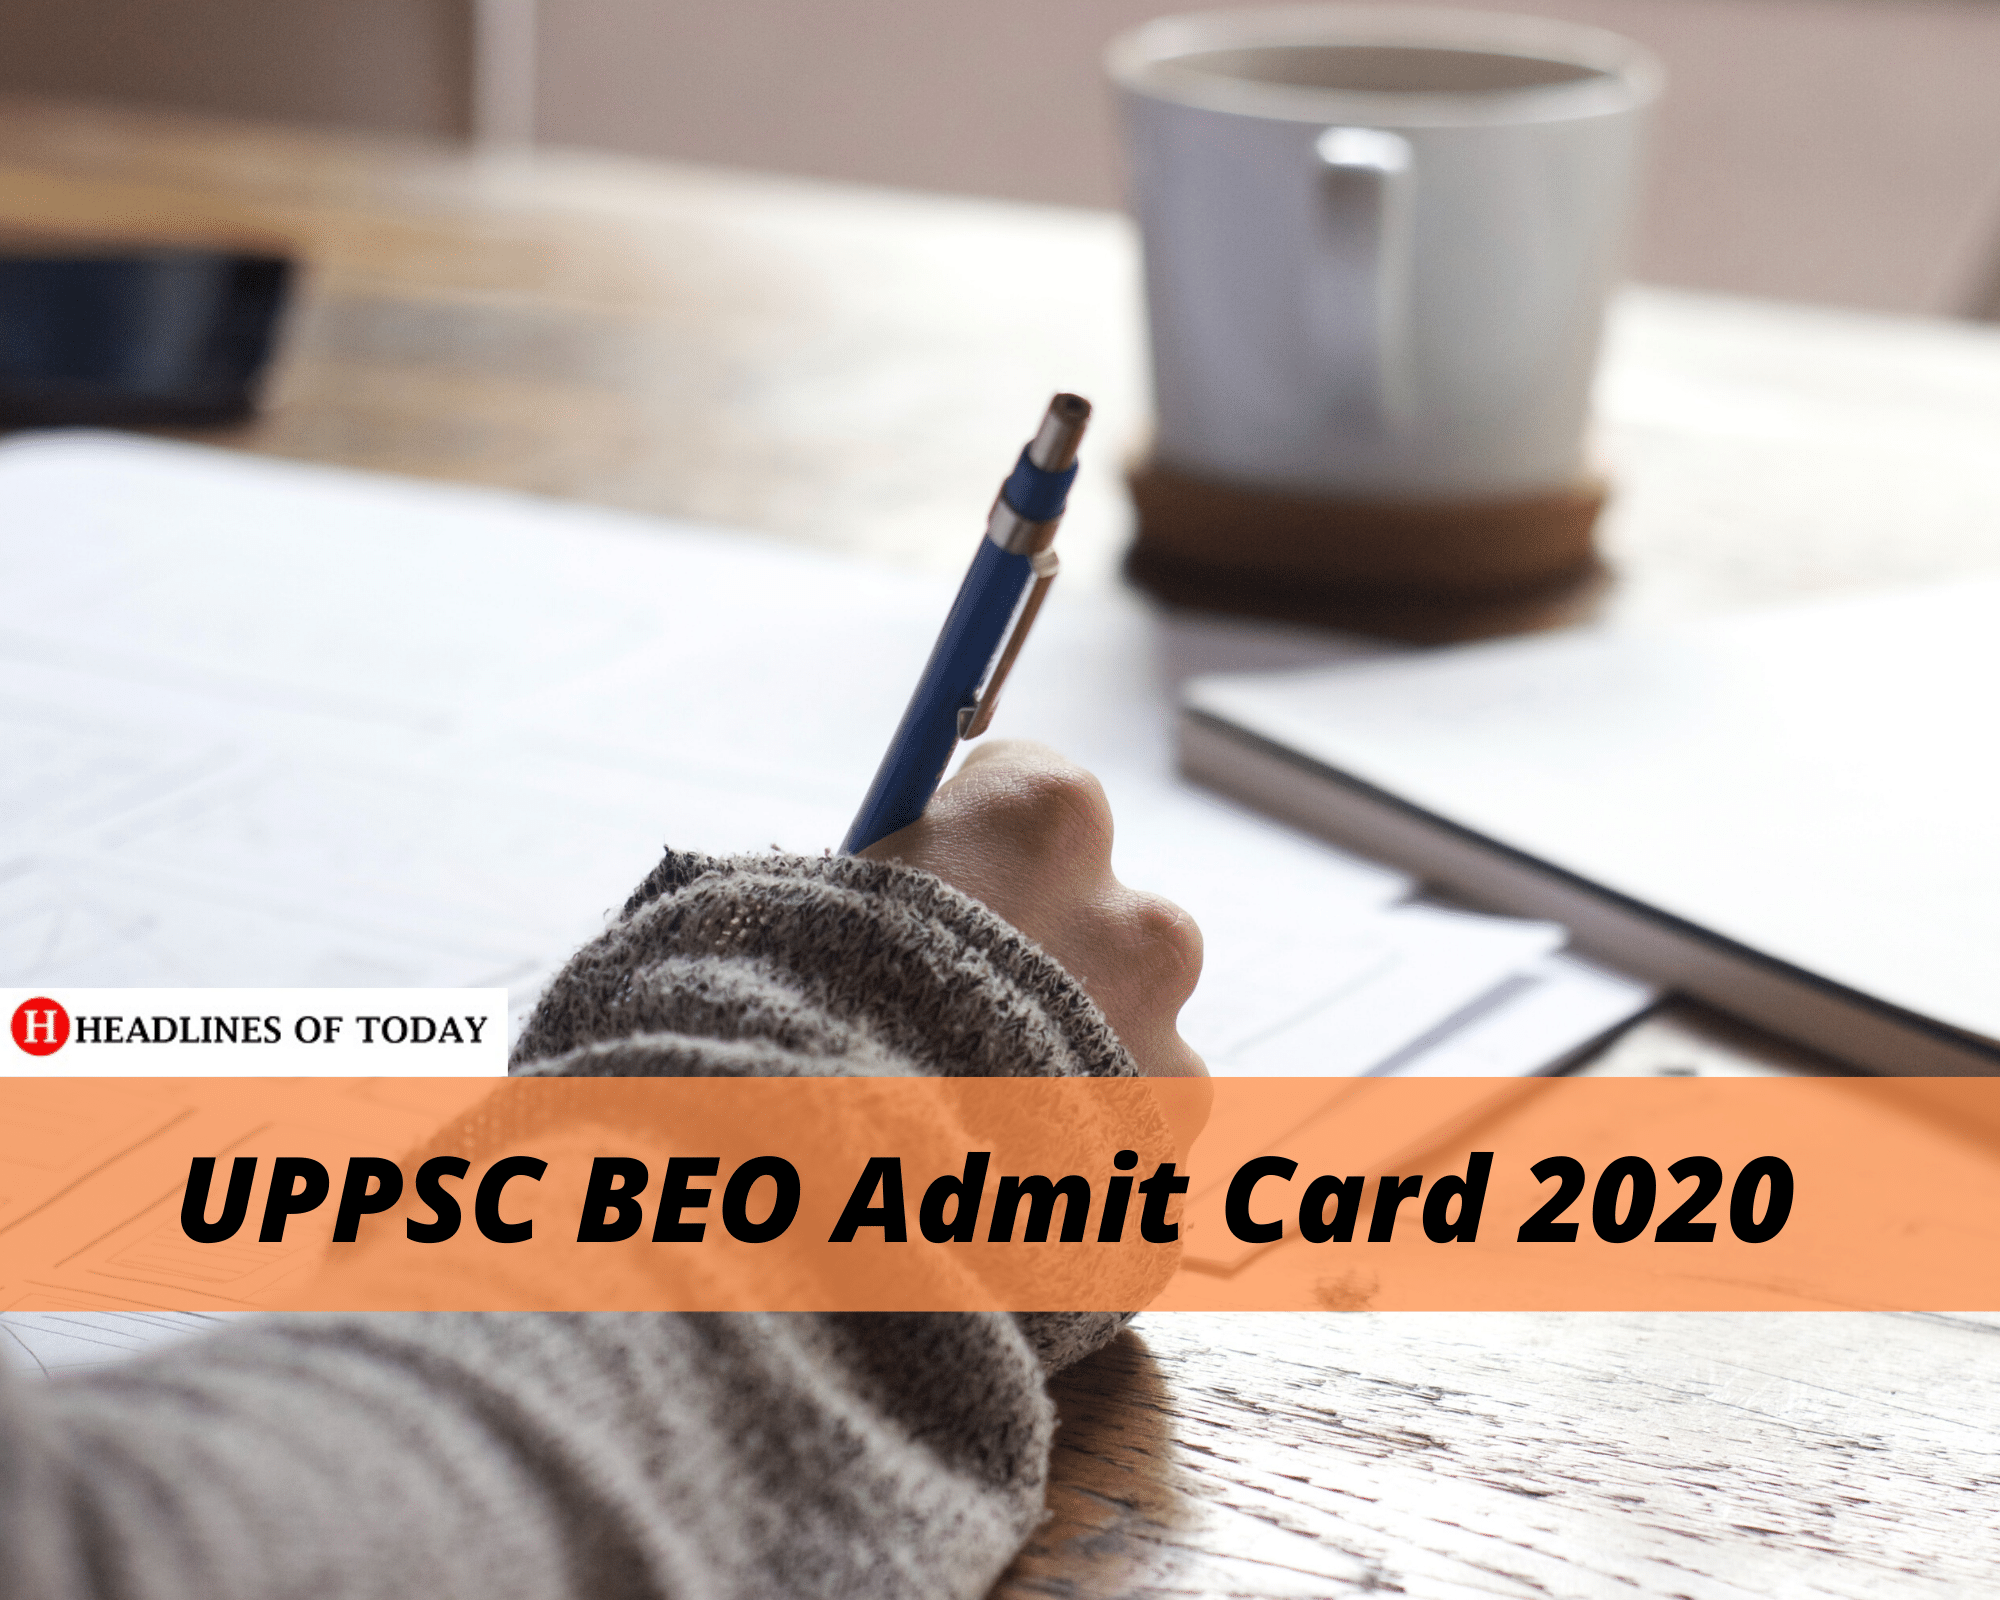 UPPSC BEO Admit Card 2020